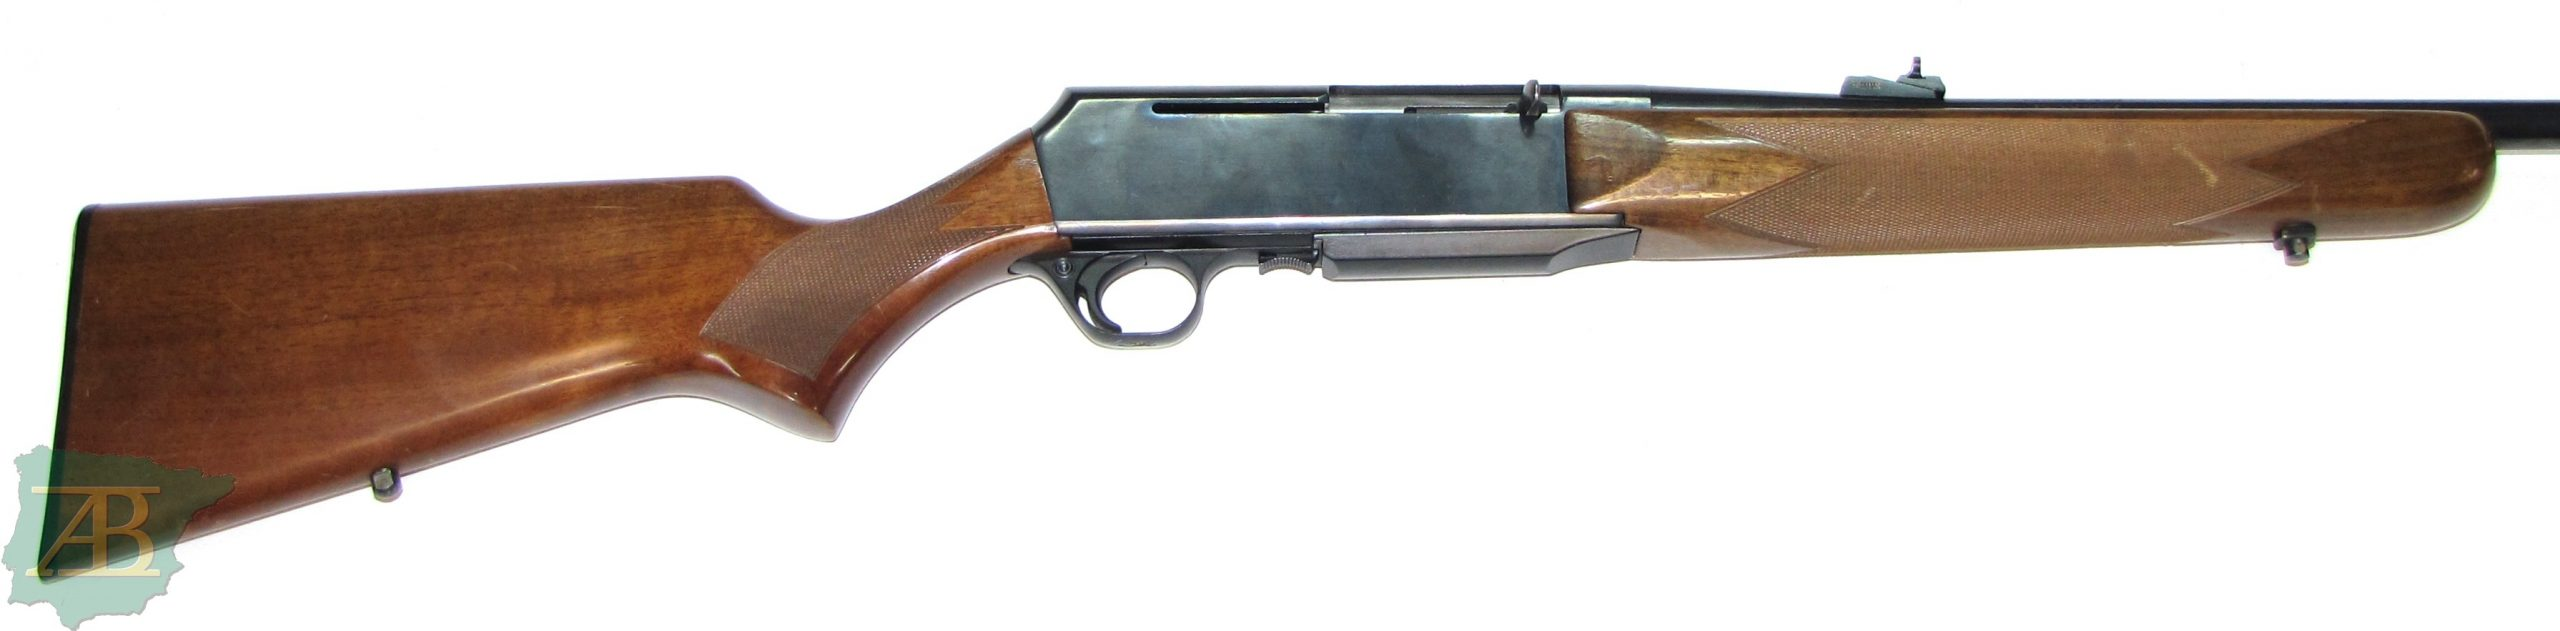 Rifle semiautomático de caza BROWNING BAR Ref 5595-armeriaiberica-2